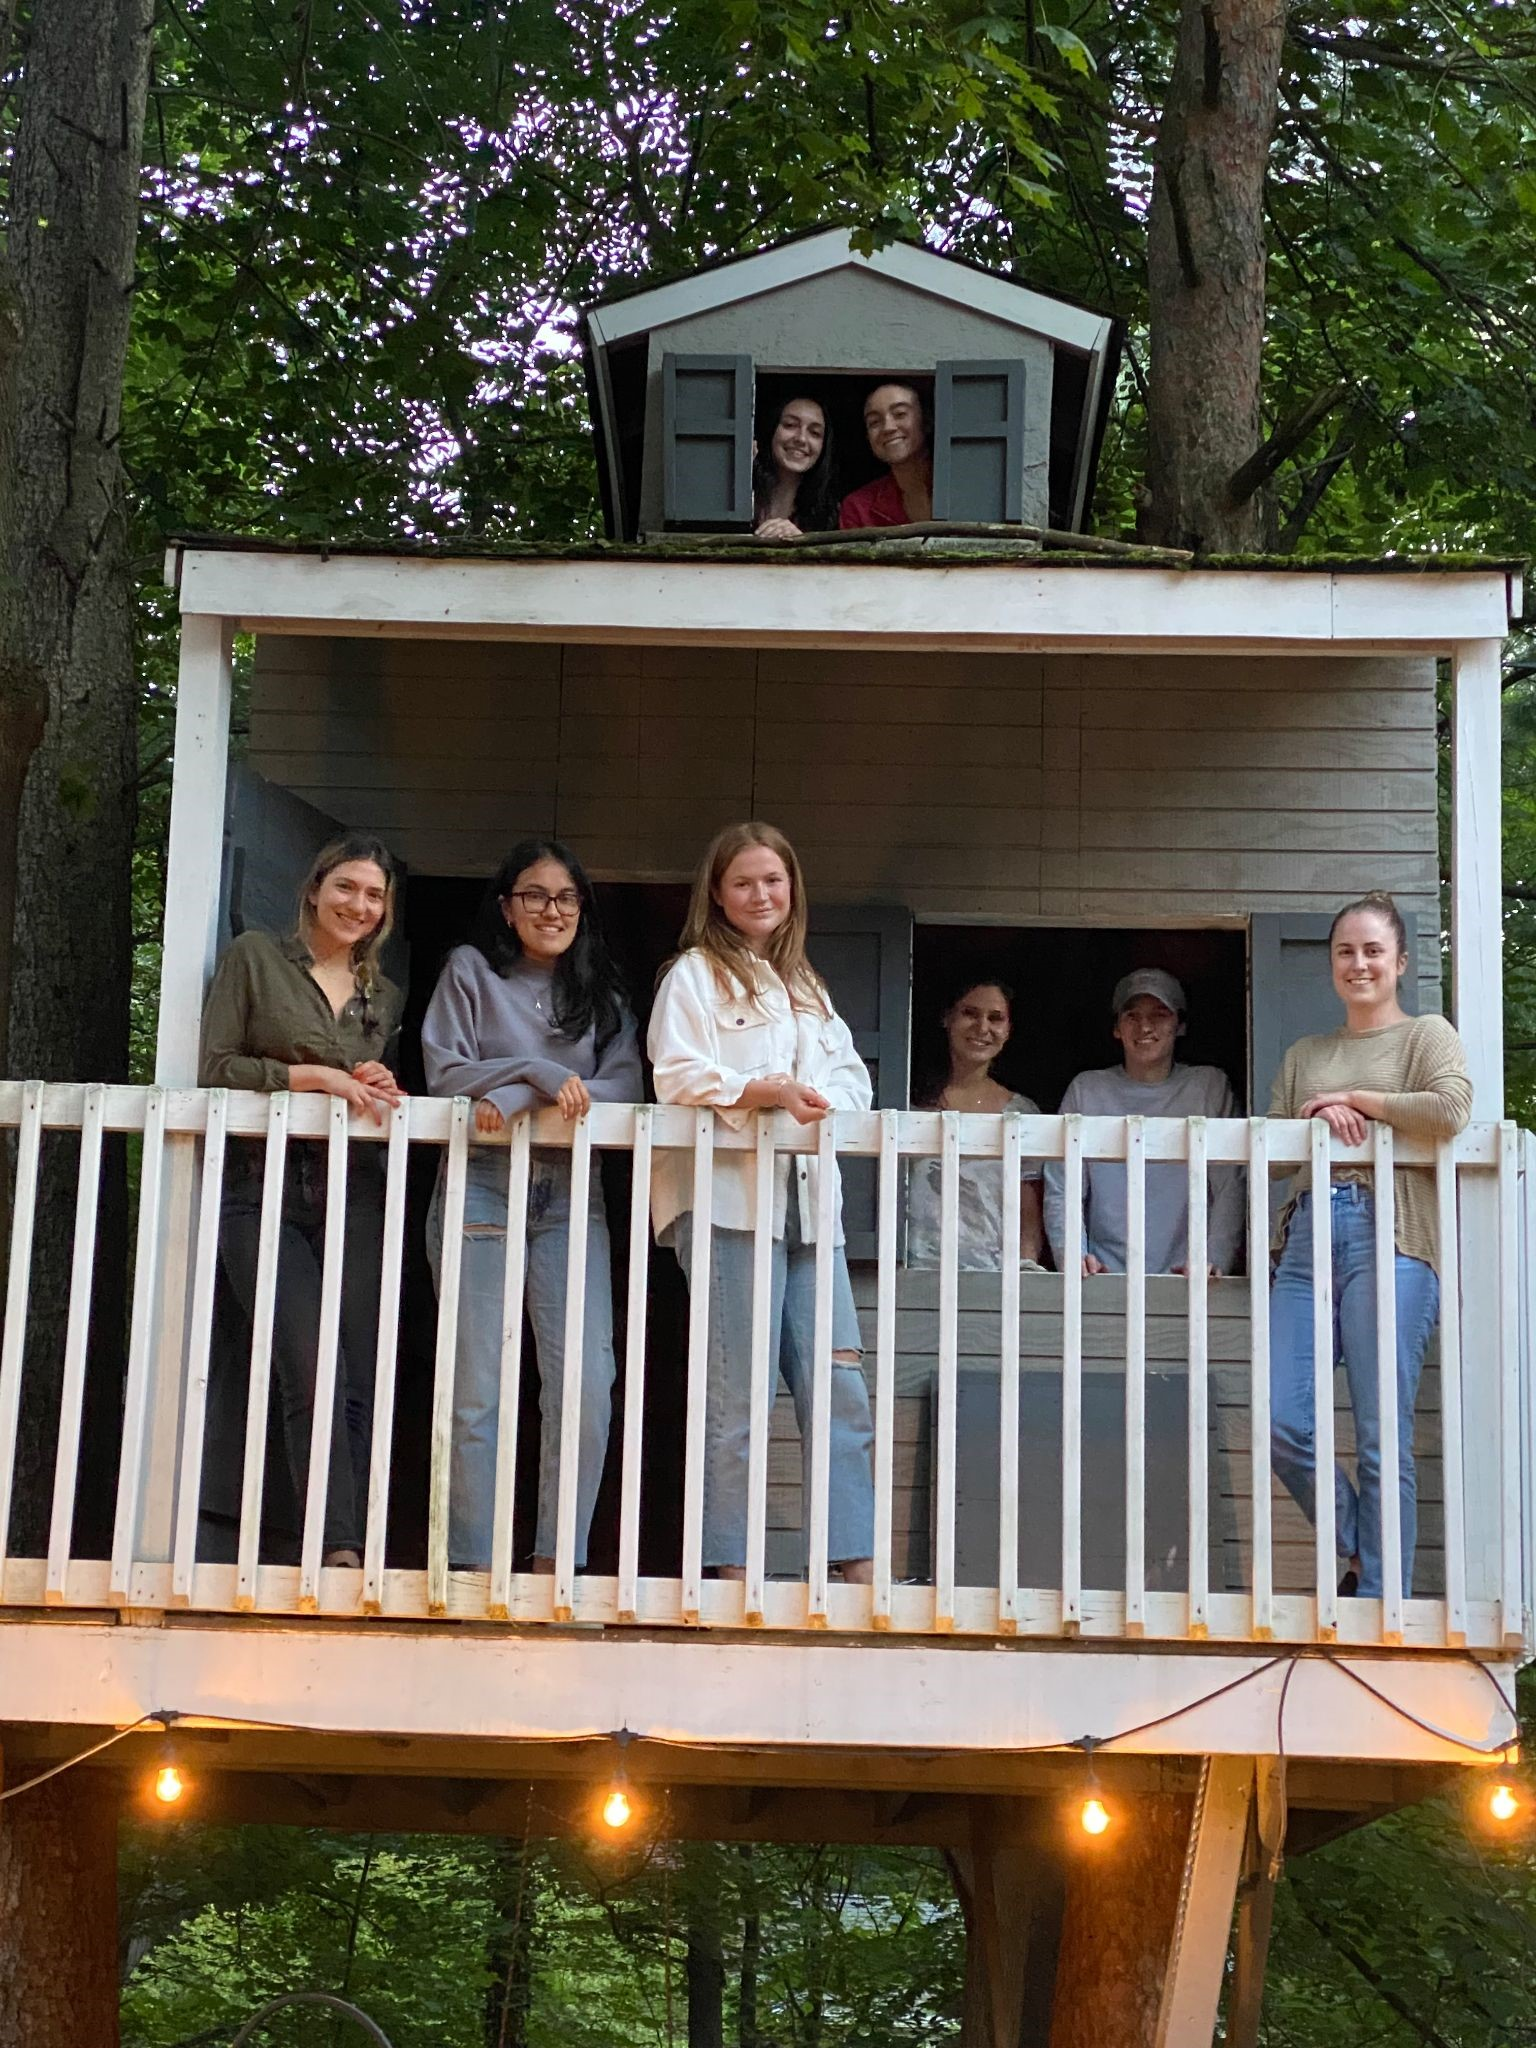 O'brien lab team in tree house